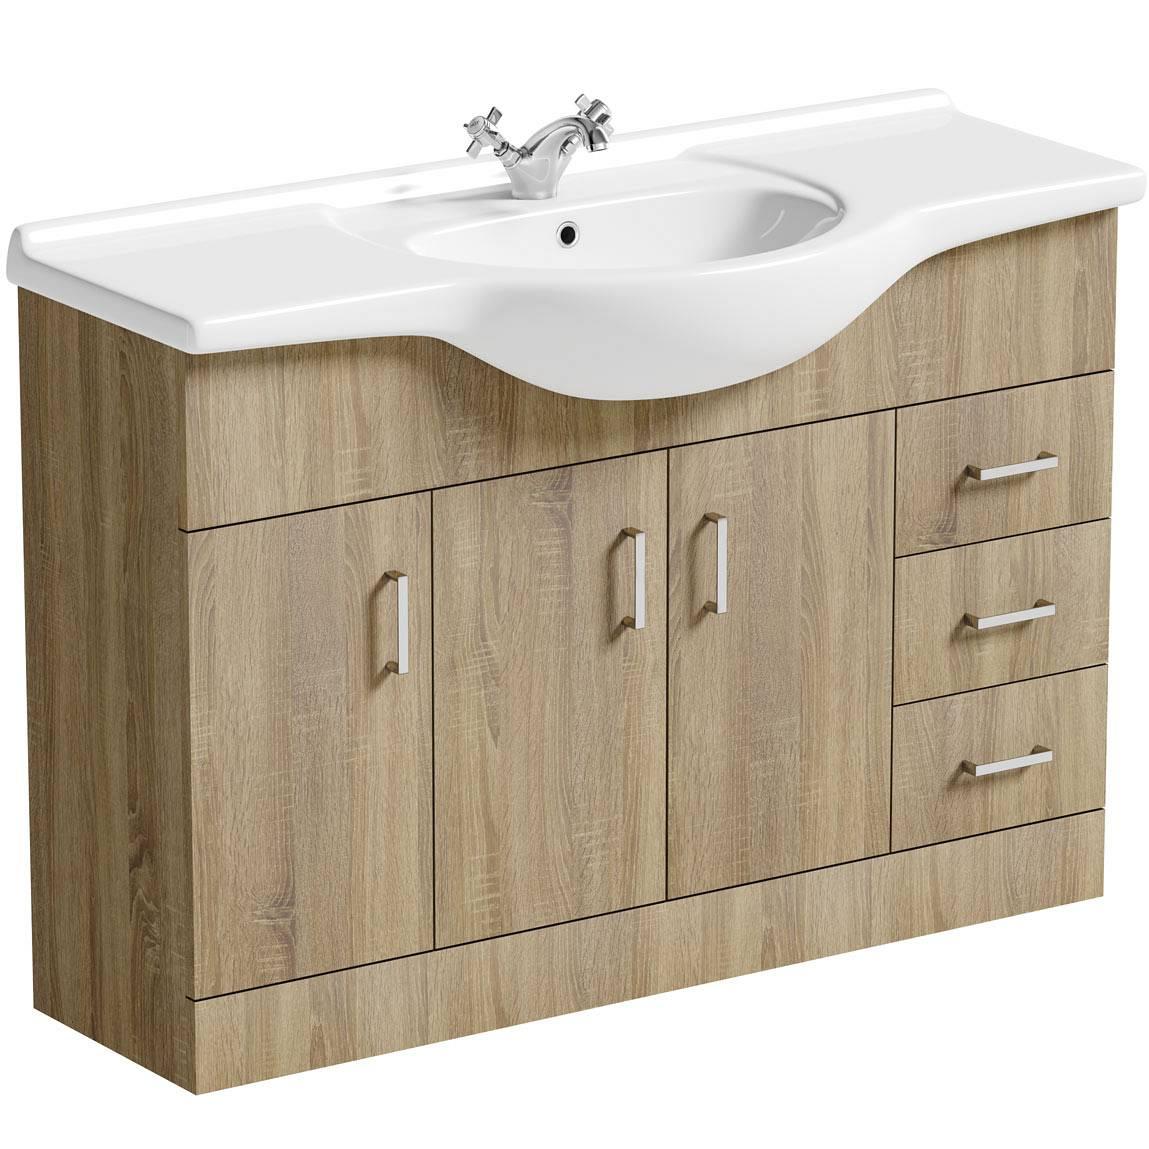 Image of Sienna Oak 120 Vanity Unit & Basin